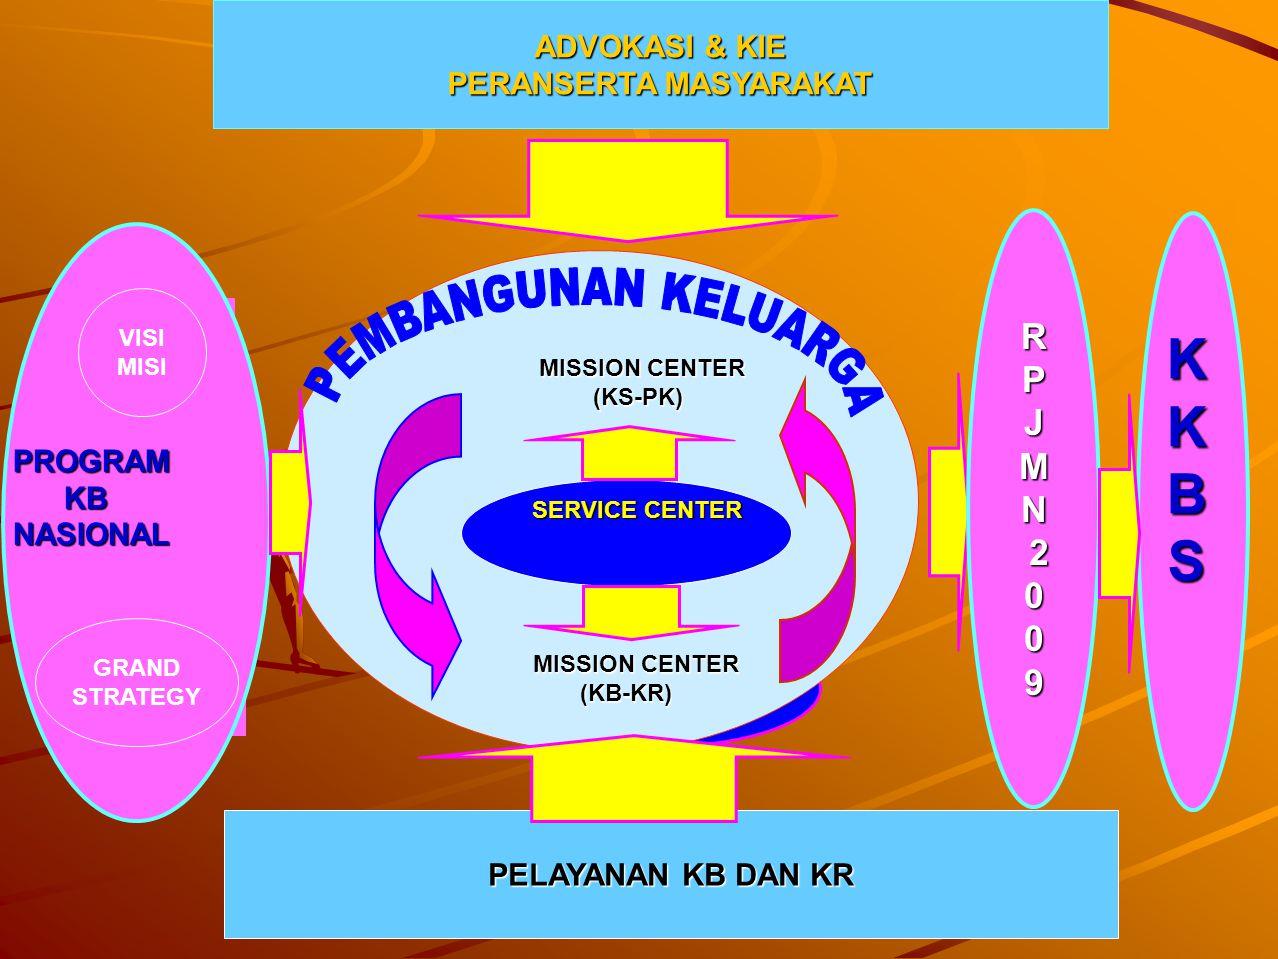 PELAYANAN KB DAN KR KKBS ADVOKASI & KIE PERANSERTA MASYARAKAT MISSION CENTER MISSION CENTER(KS-PK) (KB-KR) SERVICE CENTER VISI MISI GRAND STRATEGY PRO